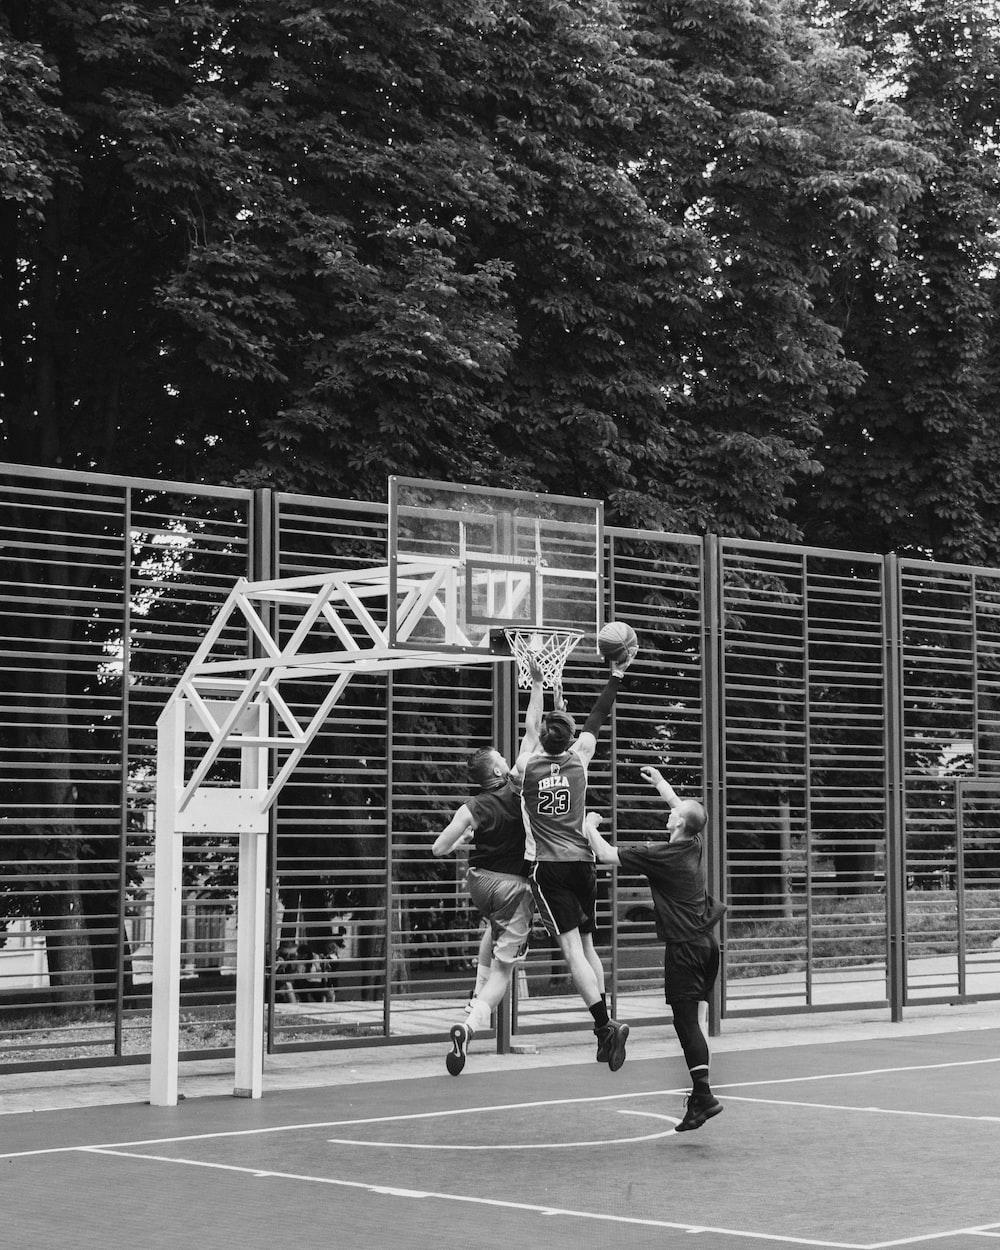 greyscale photography of people playing basketball